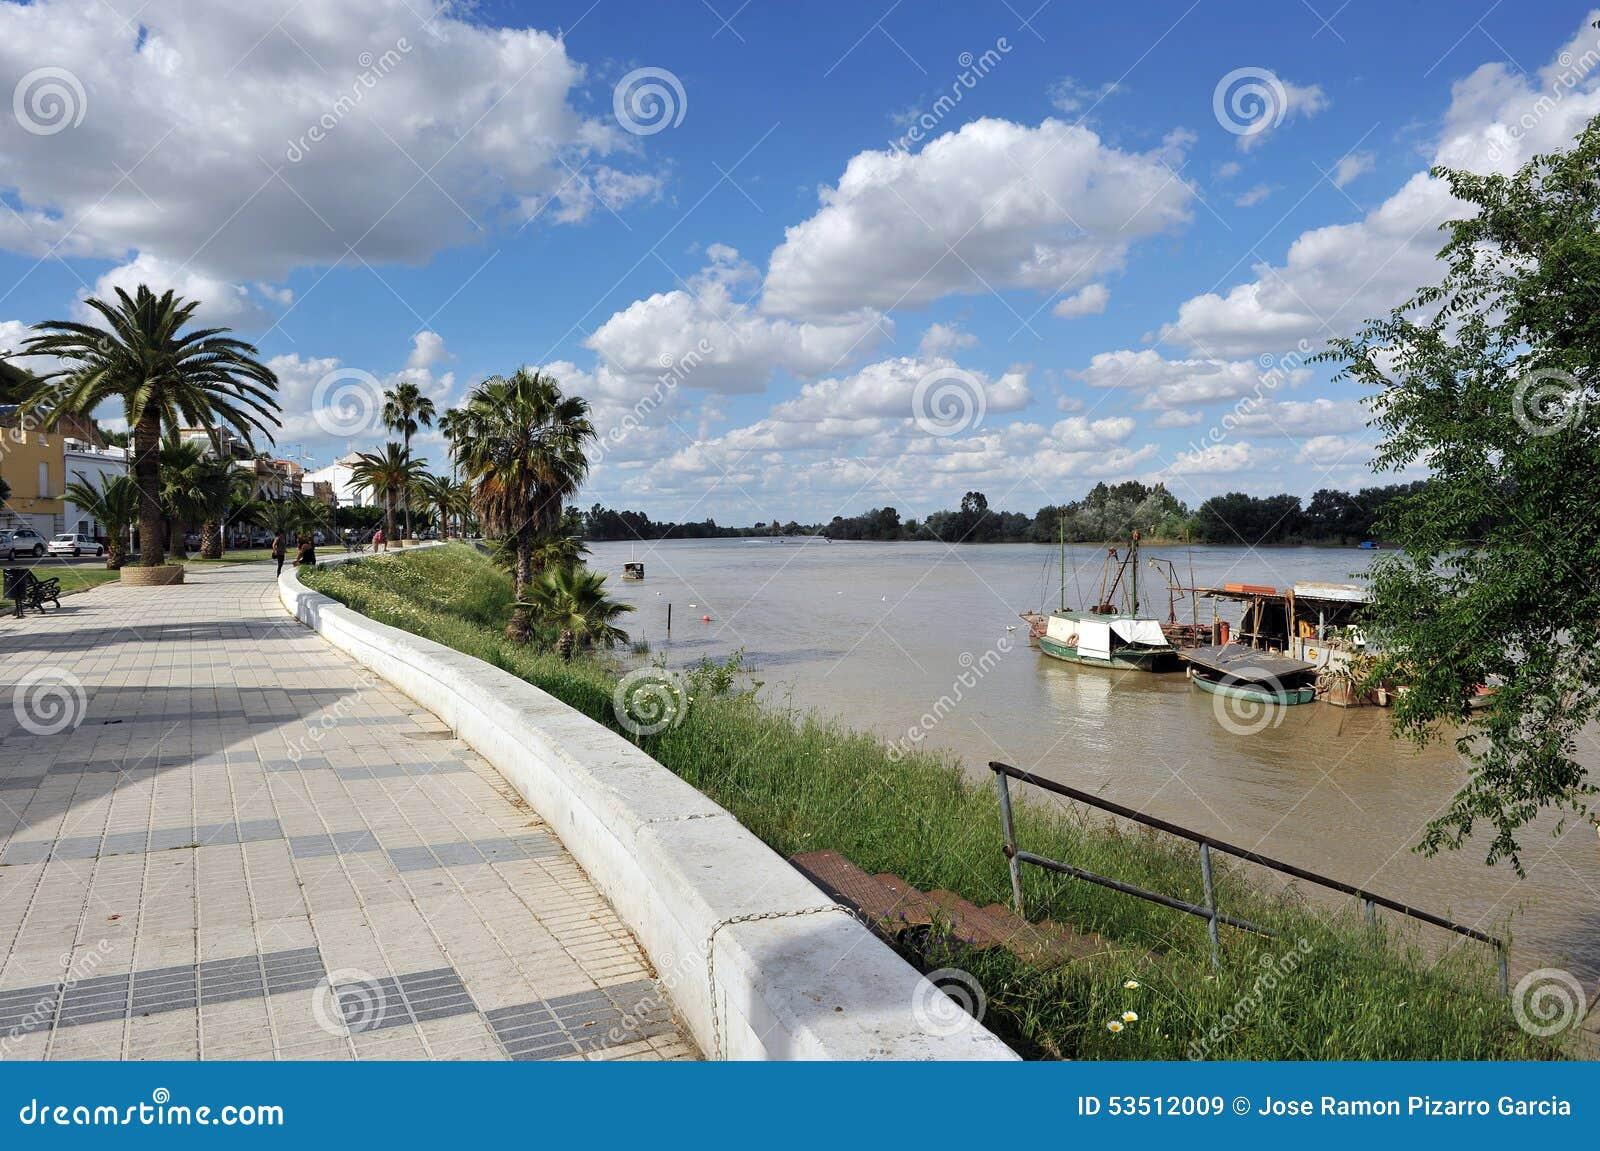 Riverside walk in the river Guadalquivir as it passes through Coria del Rio, Seville province, Andalusia, Spain